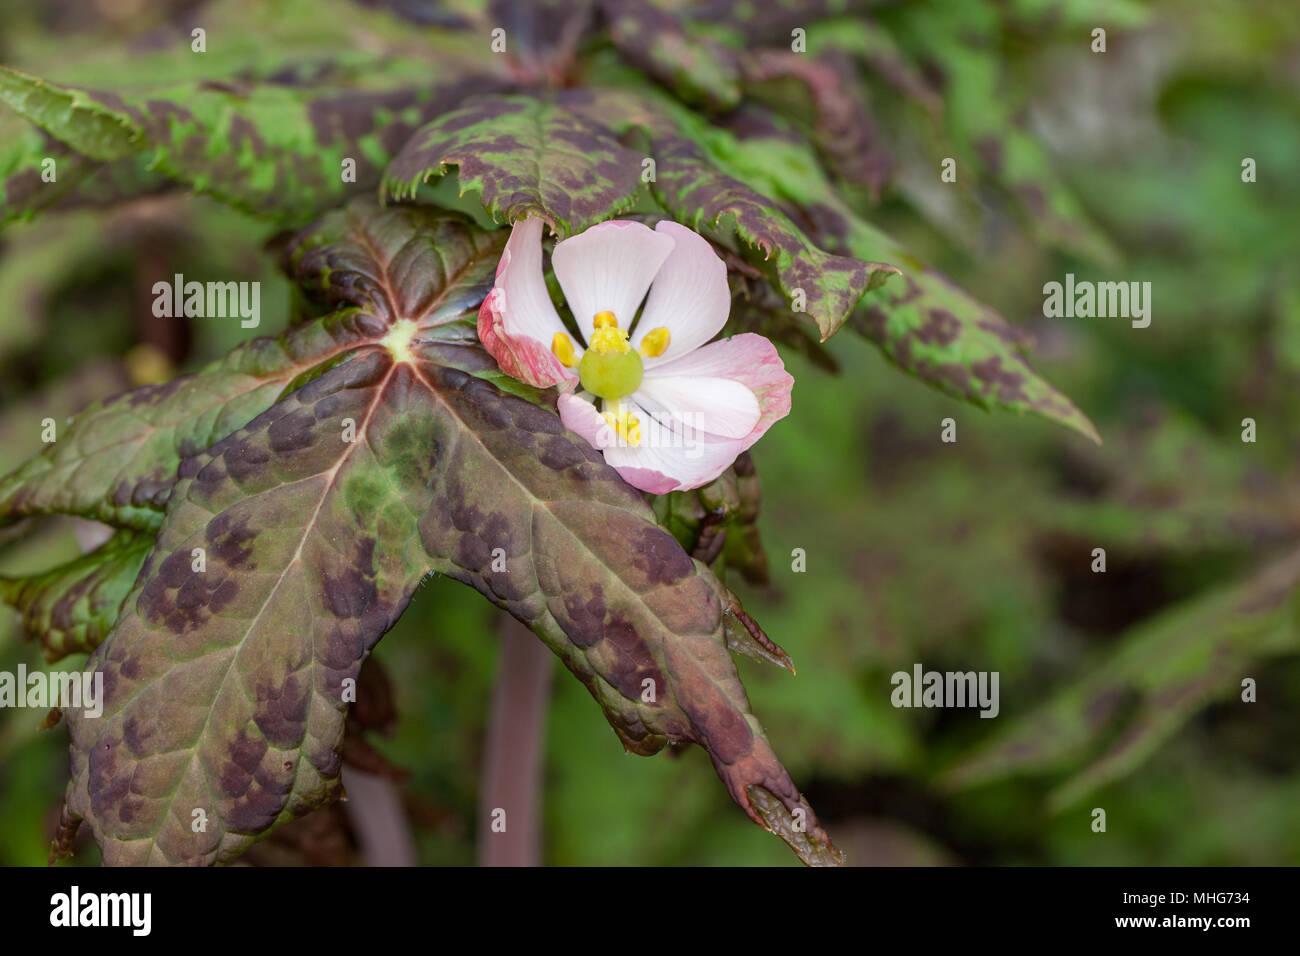 Himalayan May Apple, Kinesisk fotblad (Podophyllum hexandrum var chinensis) - Stock Image